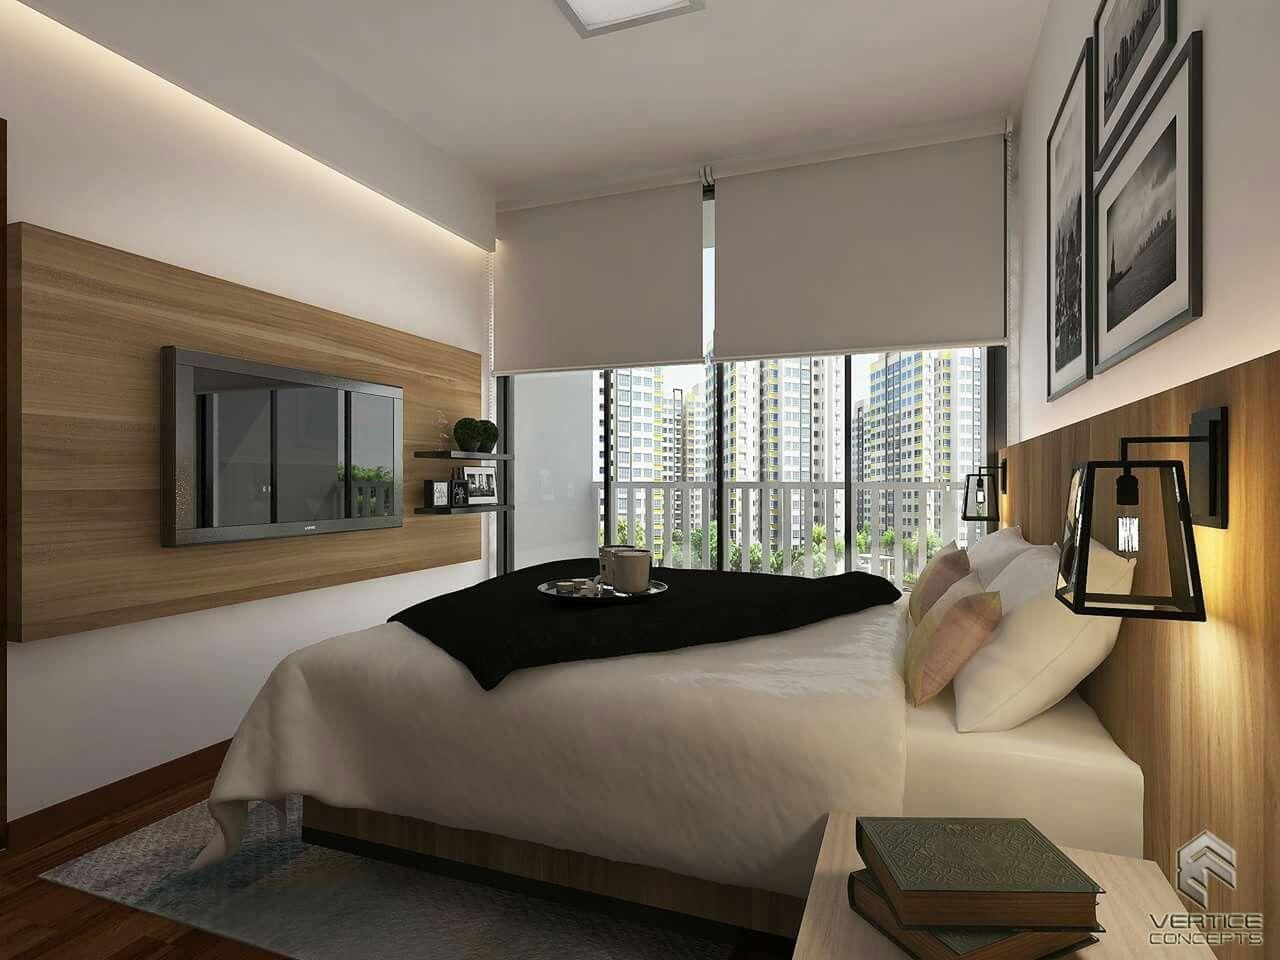 4 room bto master bedroom  Vertice Concepts Pte Ltd Master Bedroom  Interior Design